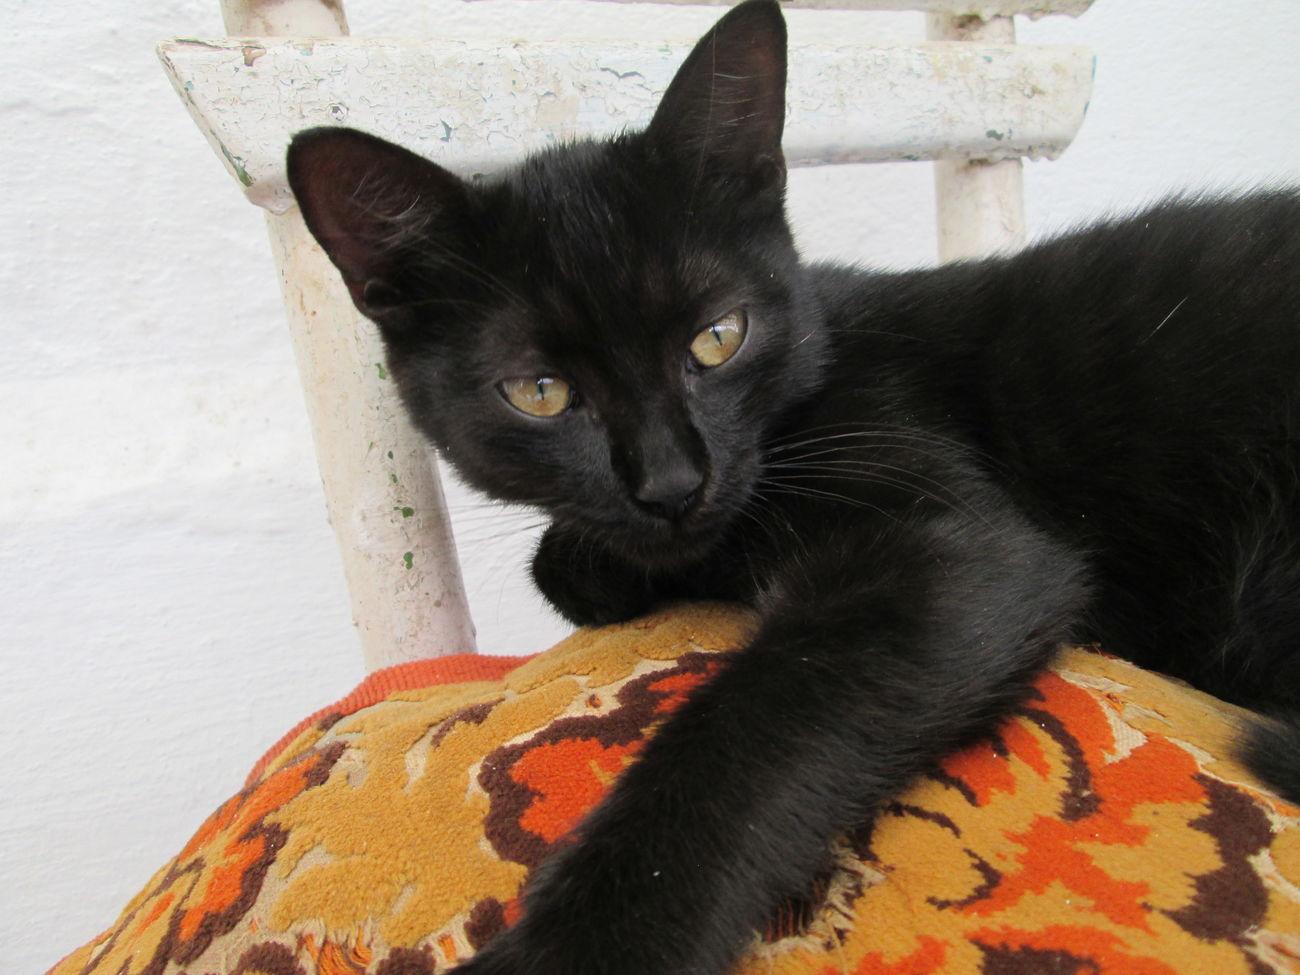 Cat♡ Catsagram Eyeem Art Zodiac Photography Cats Of EyeEm Catlady Hello World Light And Shadow Black And White Photography Photography